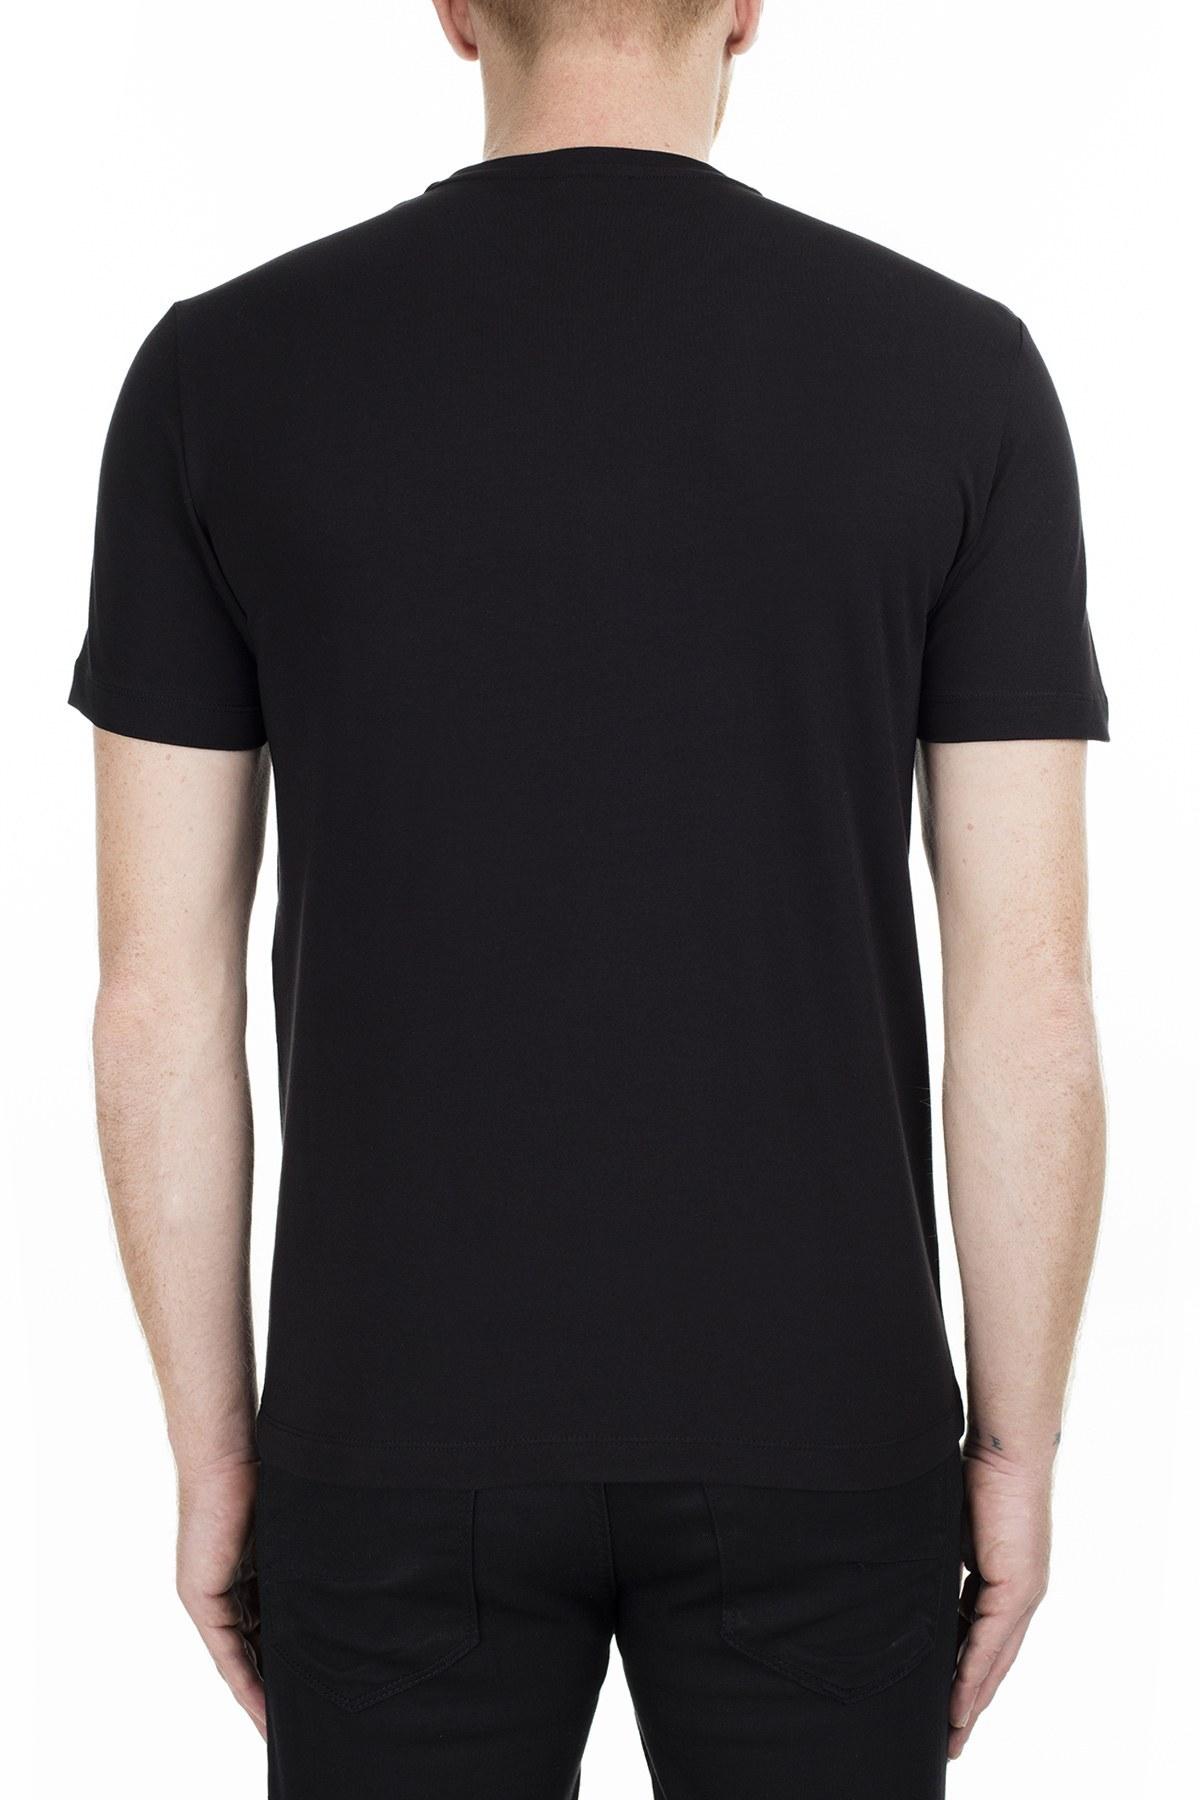 Bikkembergs Erkek T Shirt C7001D8E1823C74 SİYAH